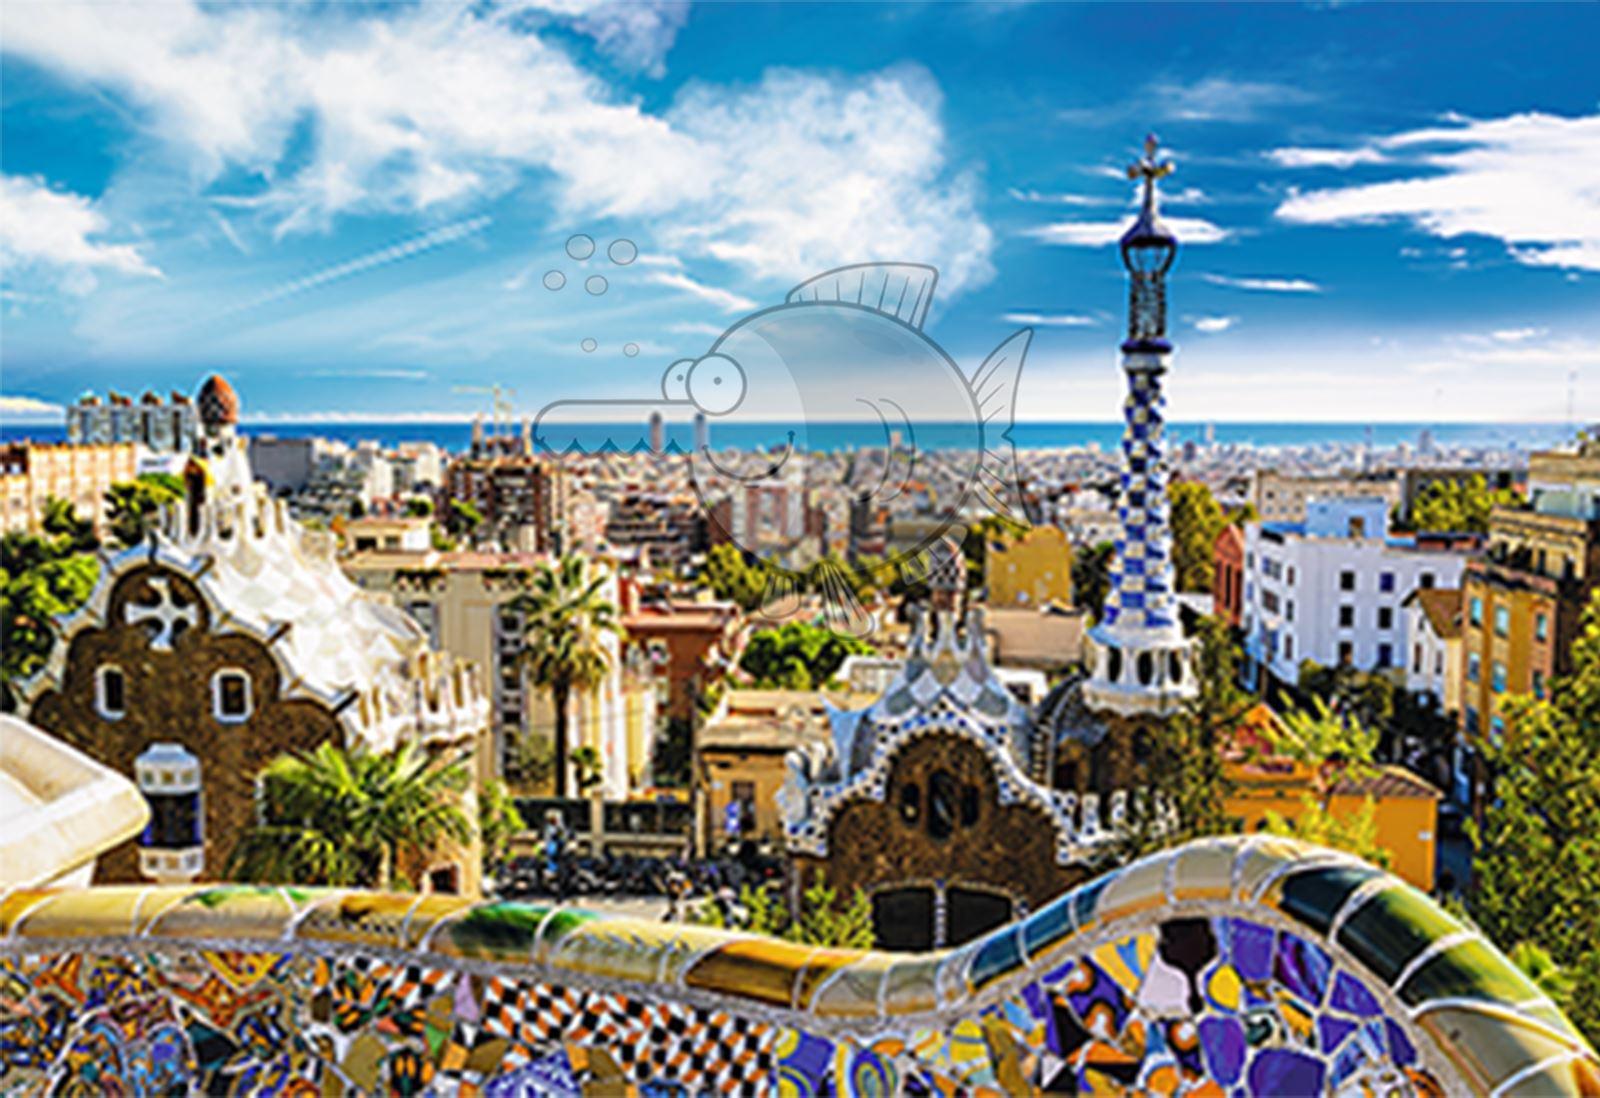 Trefl-300-500-1000-1500-2000-3000-4000-6000-Piece-Jigsaw-Puzzle-Landscapes-City thumbnail 258